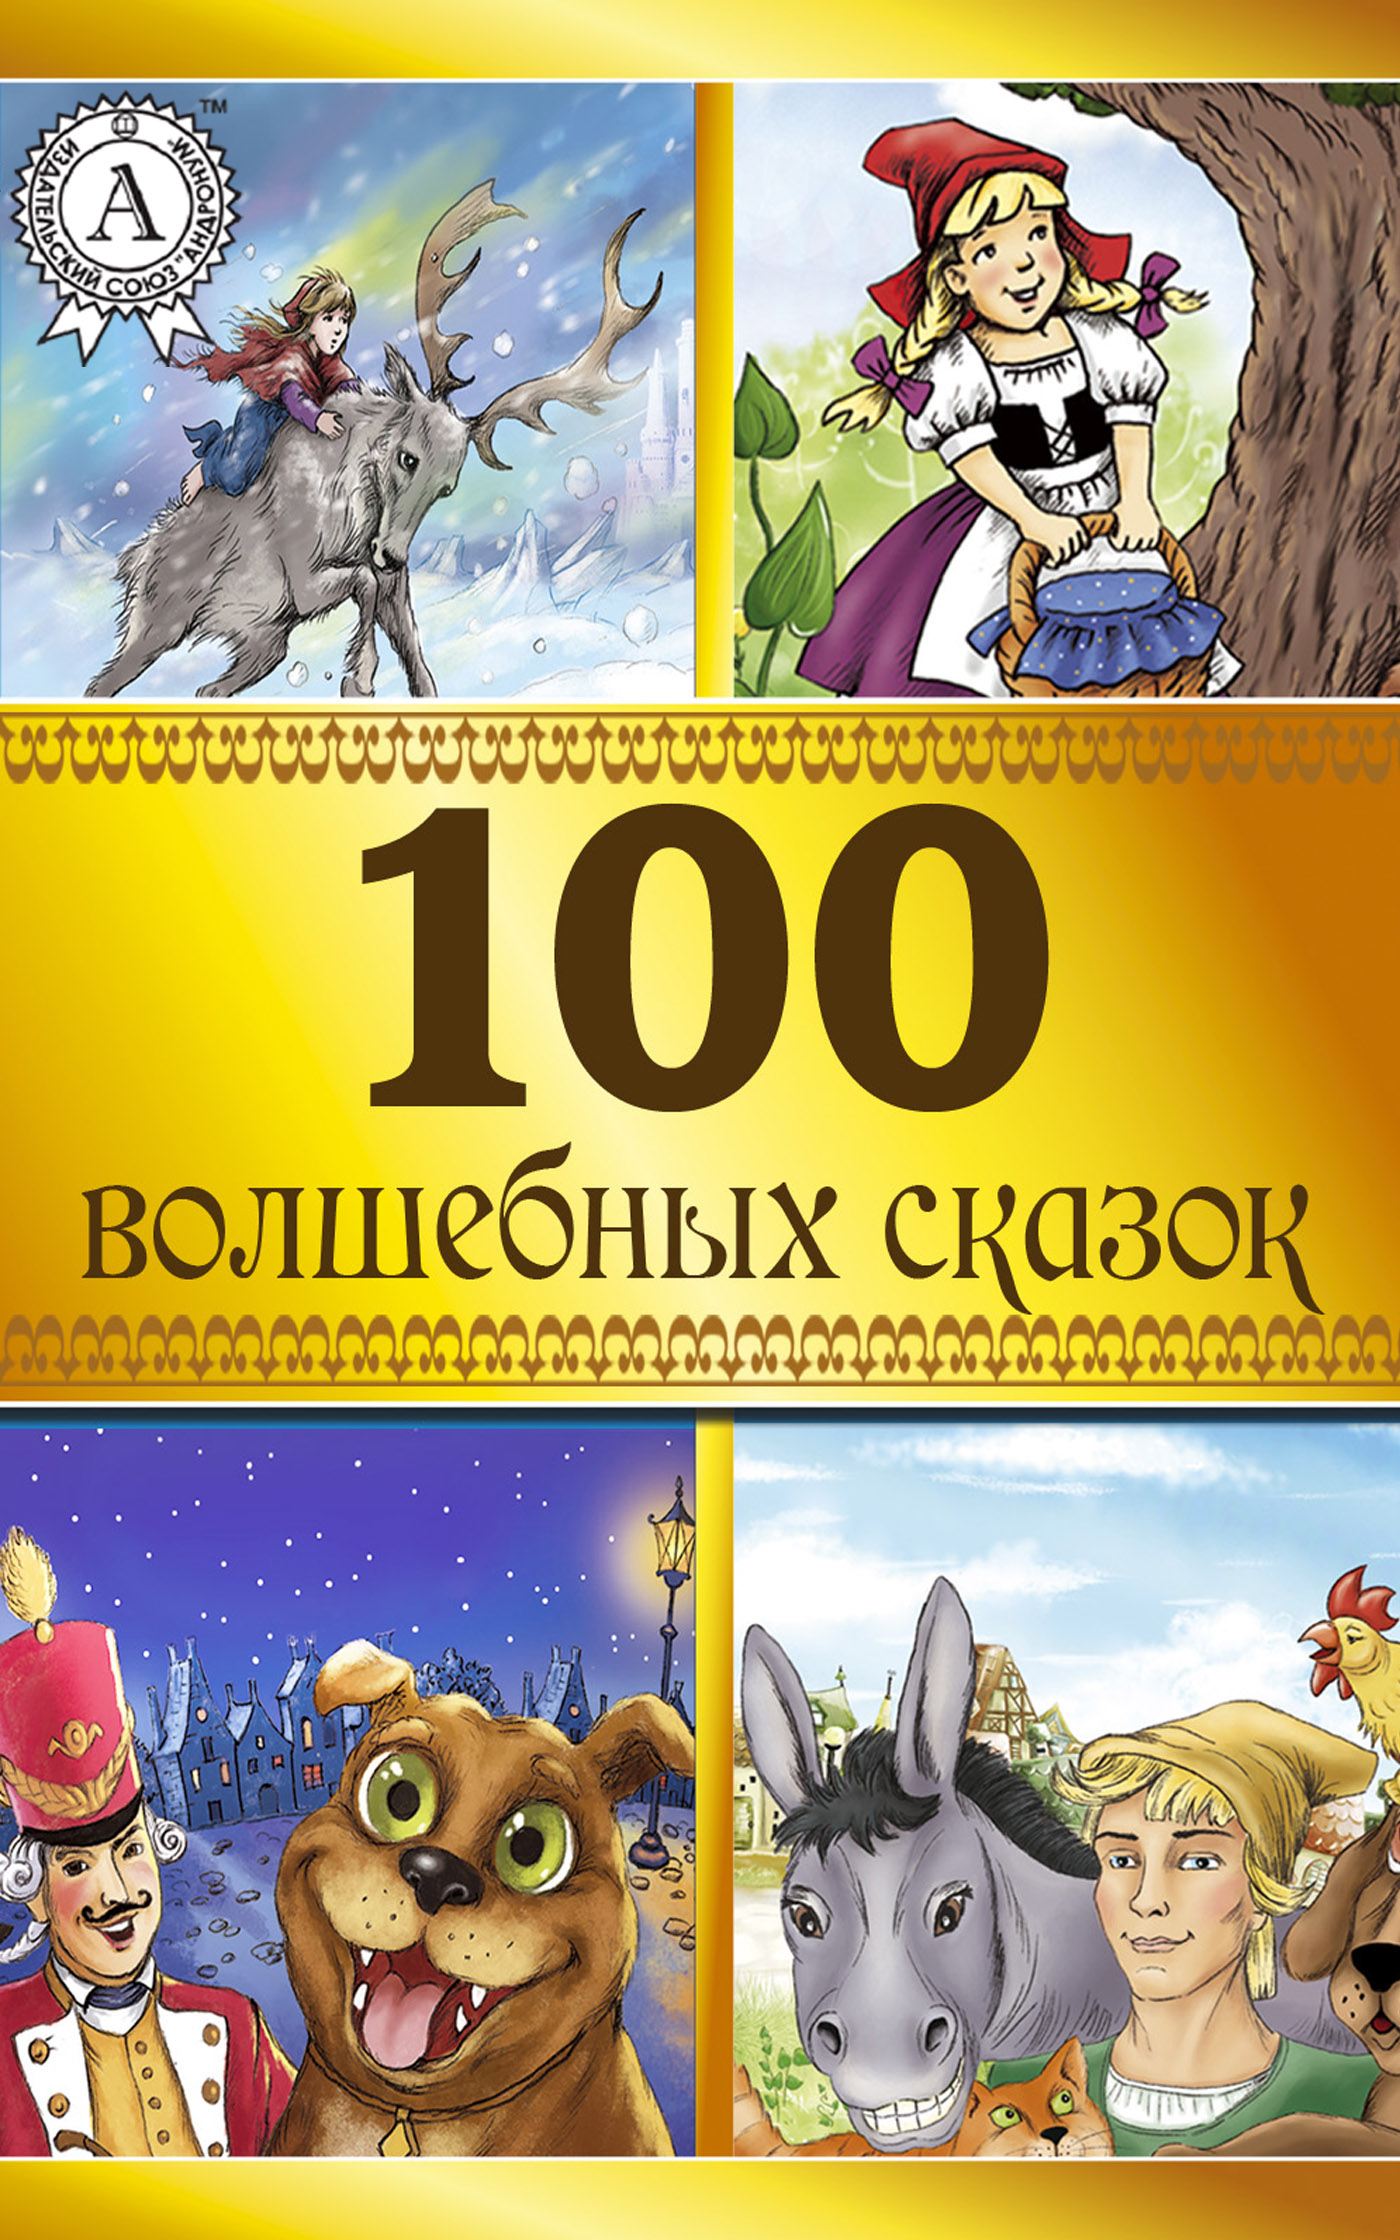 100 ��������� ������